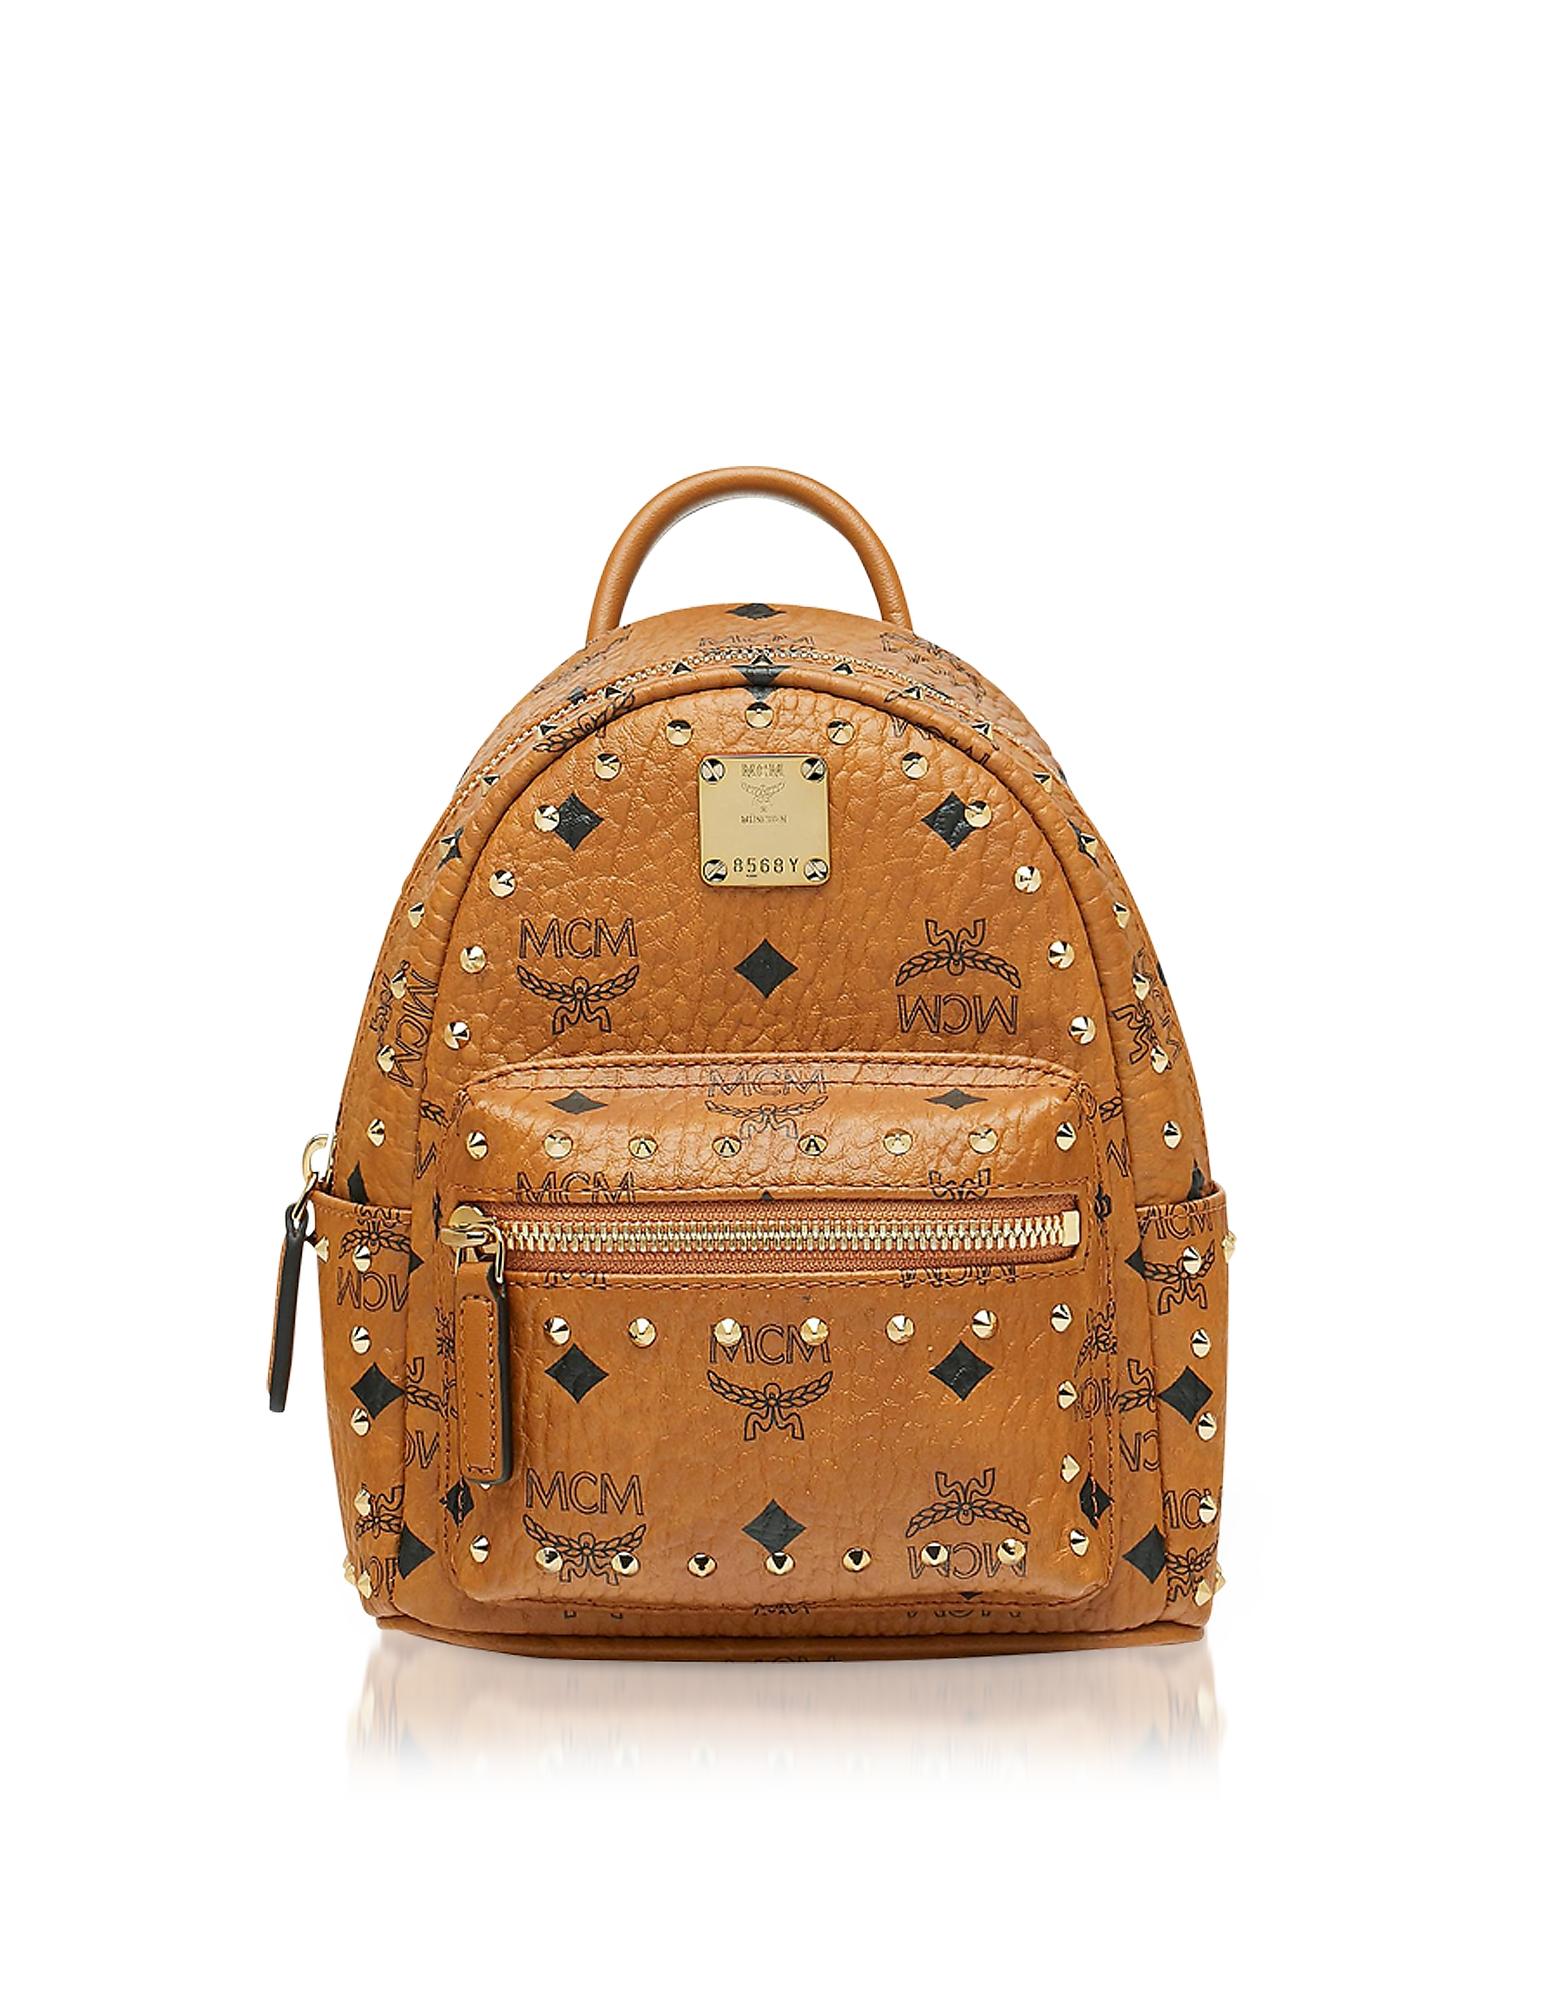 MCM Handbags, Studded Outline Visetos Stark Bebe Boo X-Mini Backpack